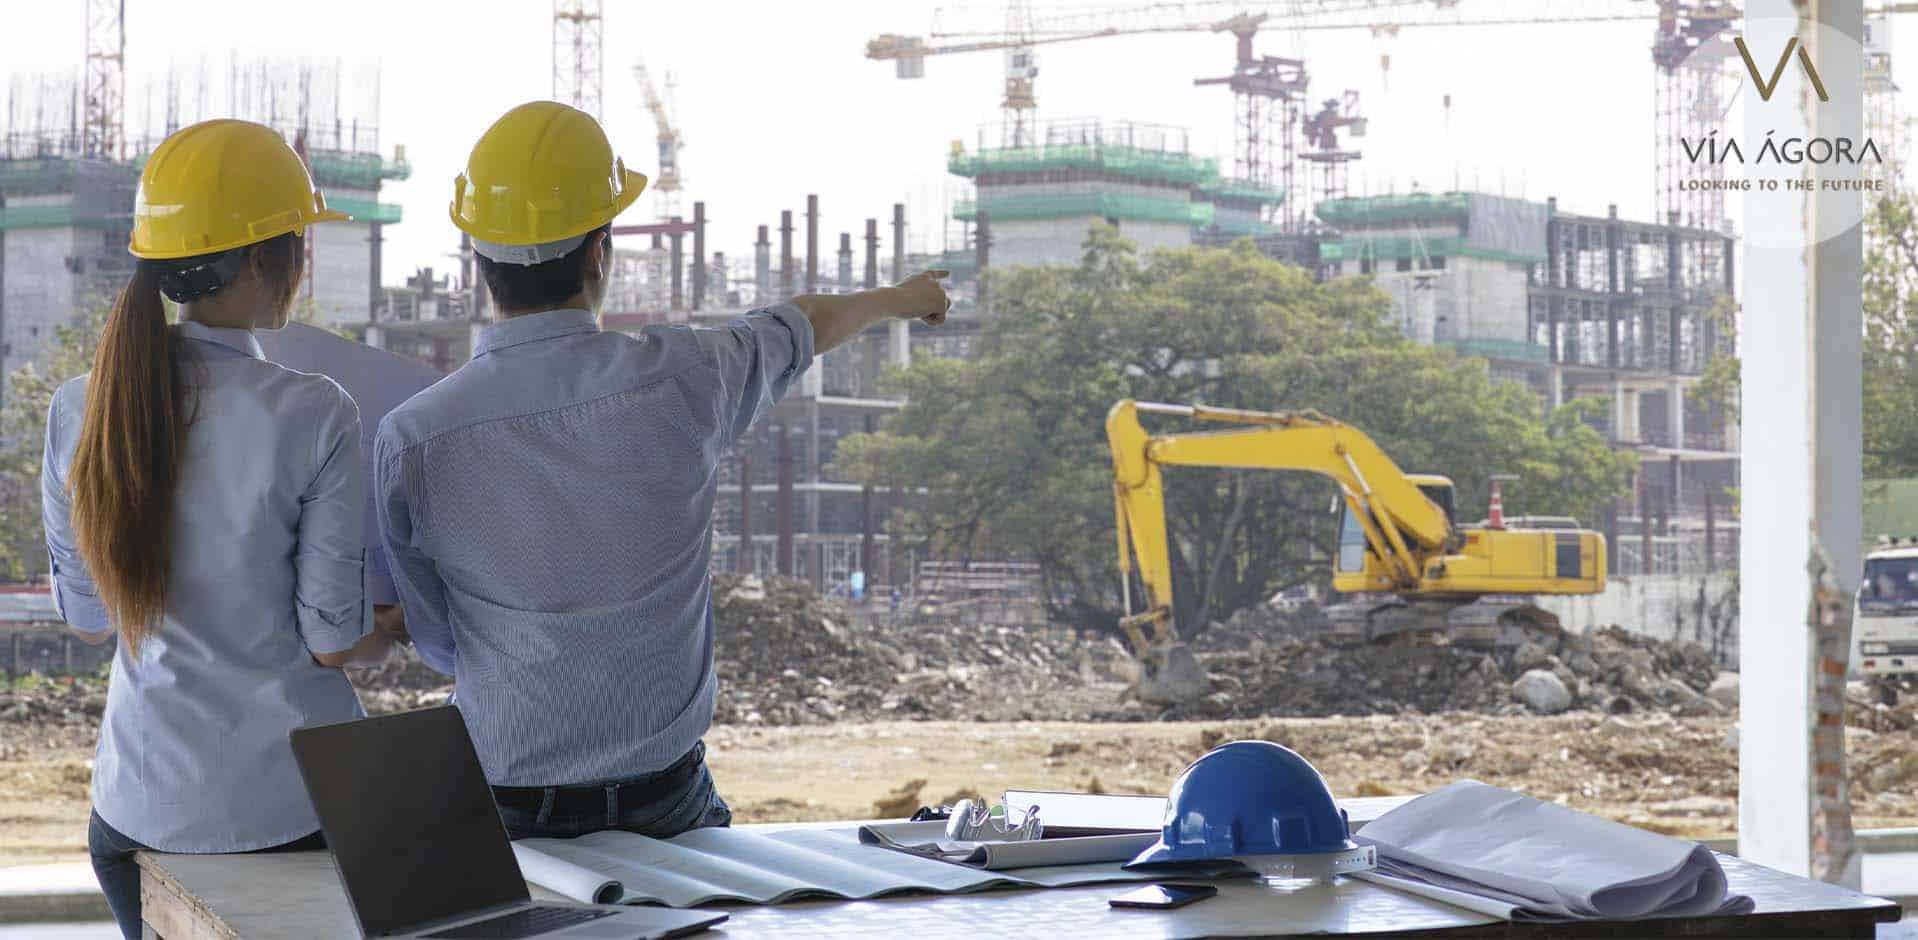 via agora - promotora inmobiliaria - cascos de construcción - 3